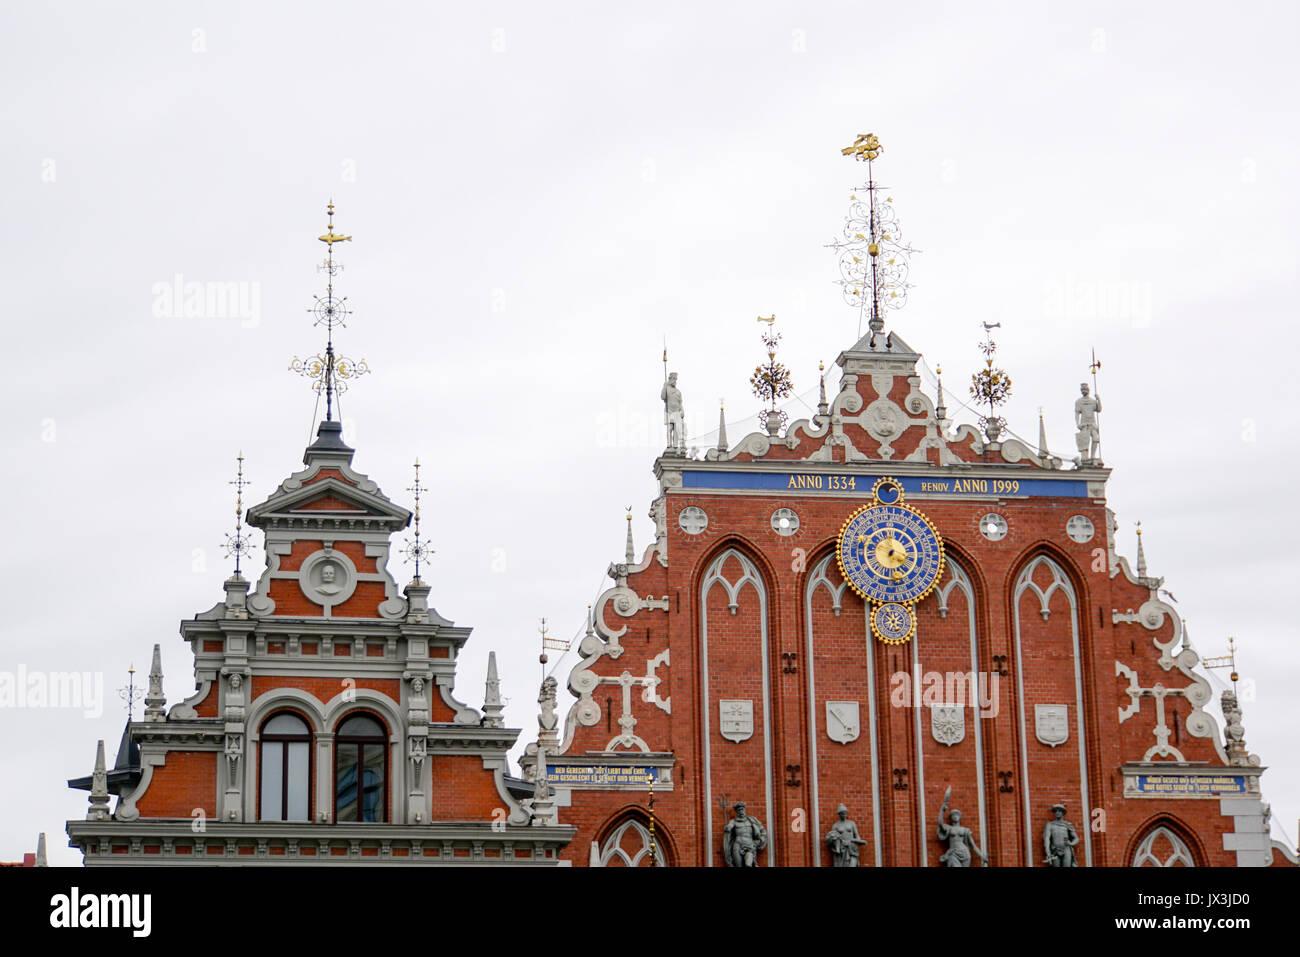 House of the Blackheads, Riga, Latvia - Stock Image